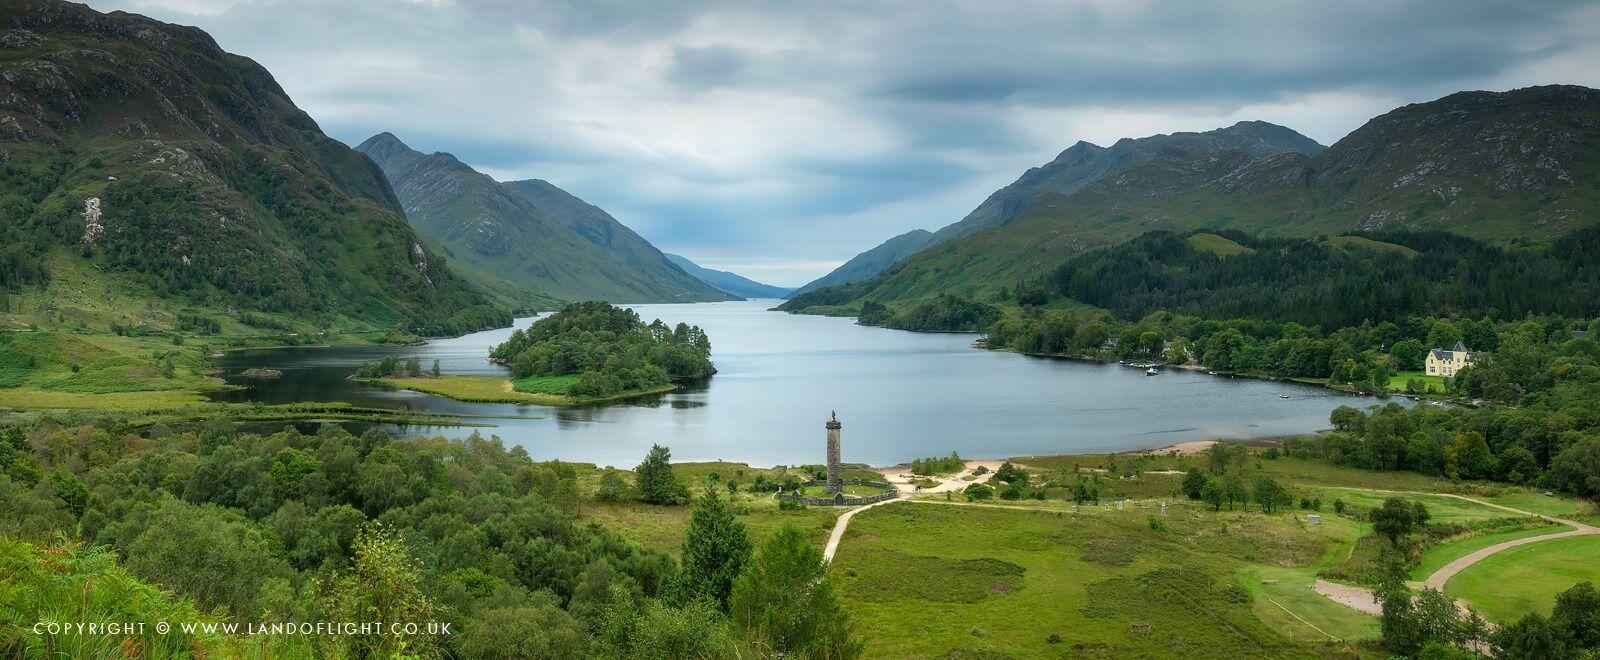 Glenfinnan Monument & Loch Shiel